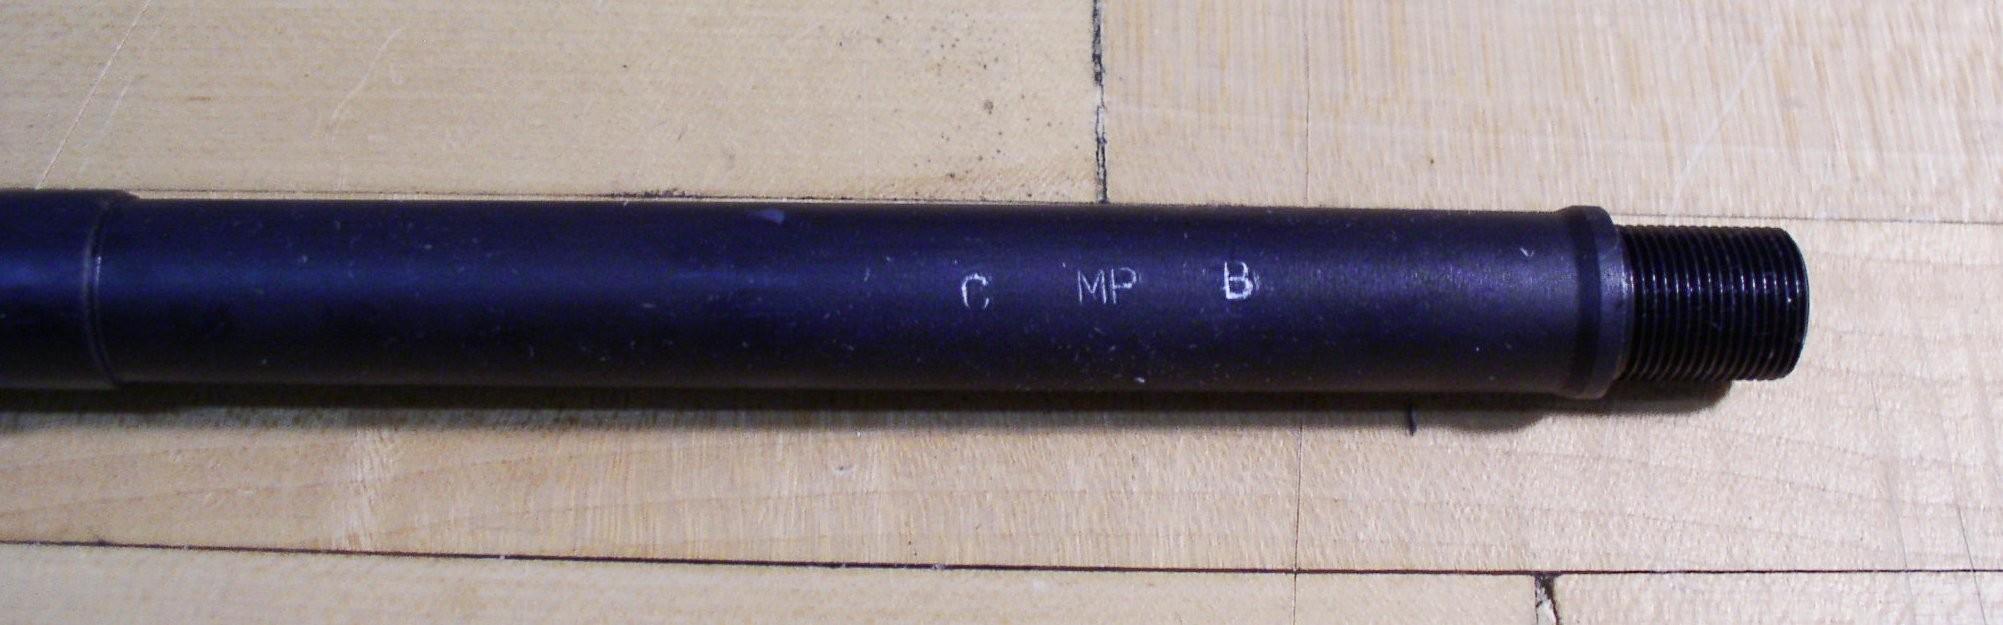 M16 Spare Barrels   WeaponsMan